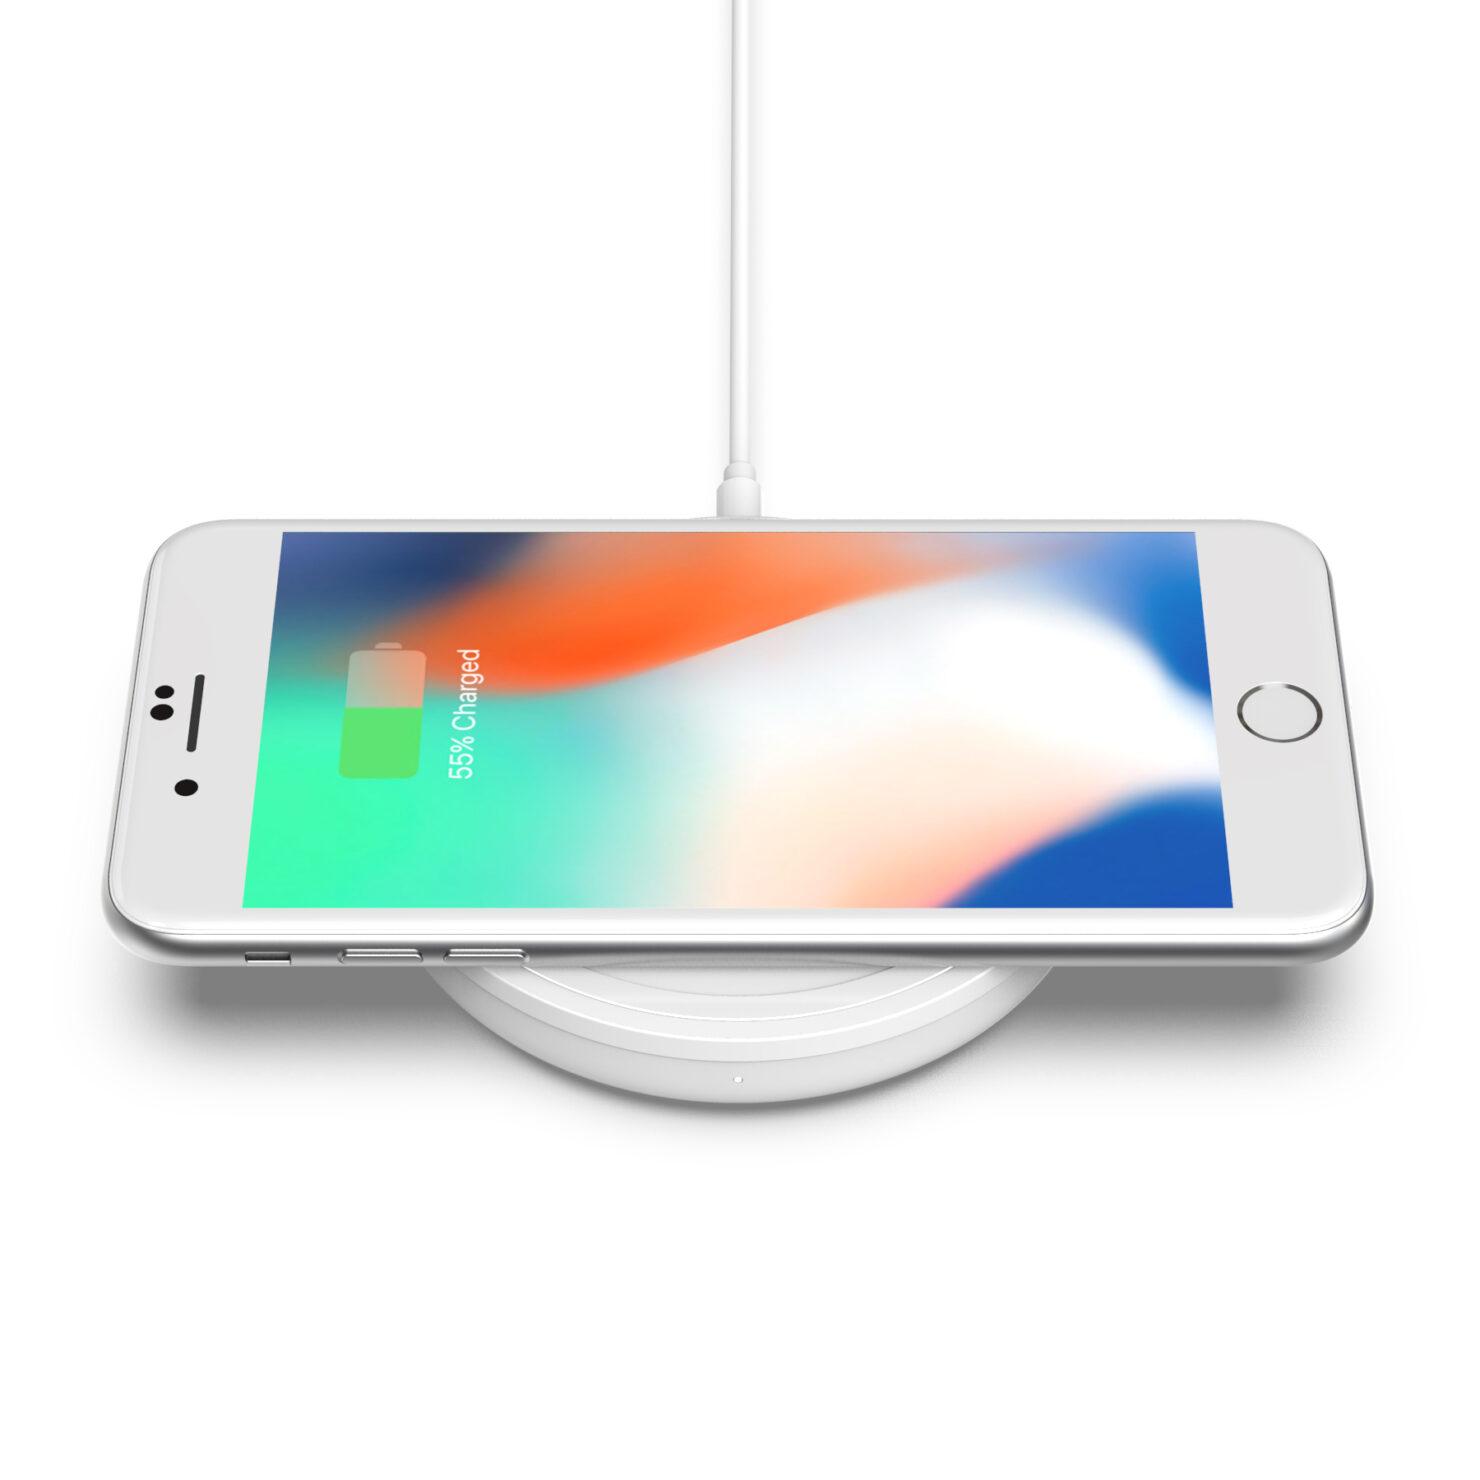 bold_charging_pad_iphone_4